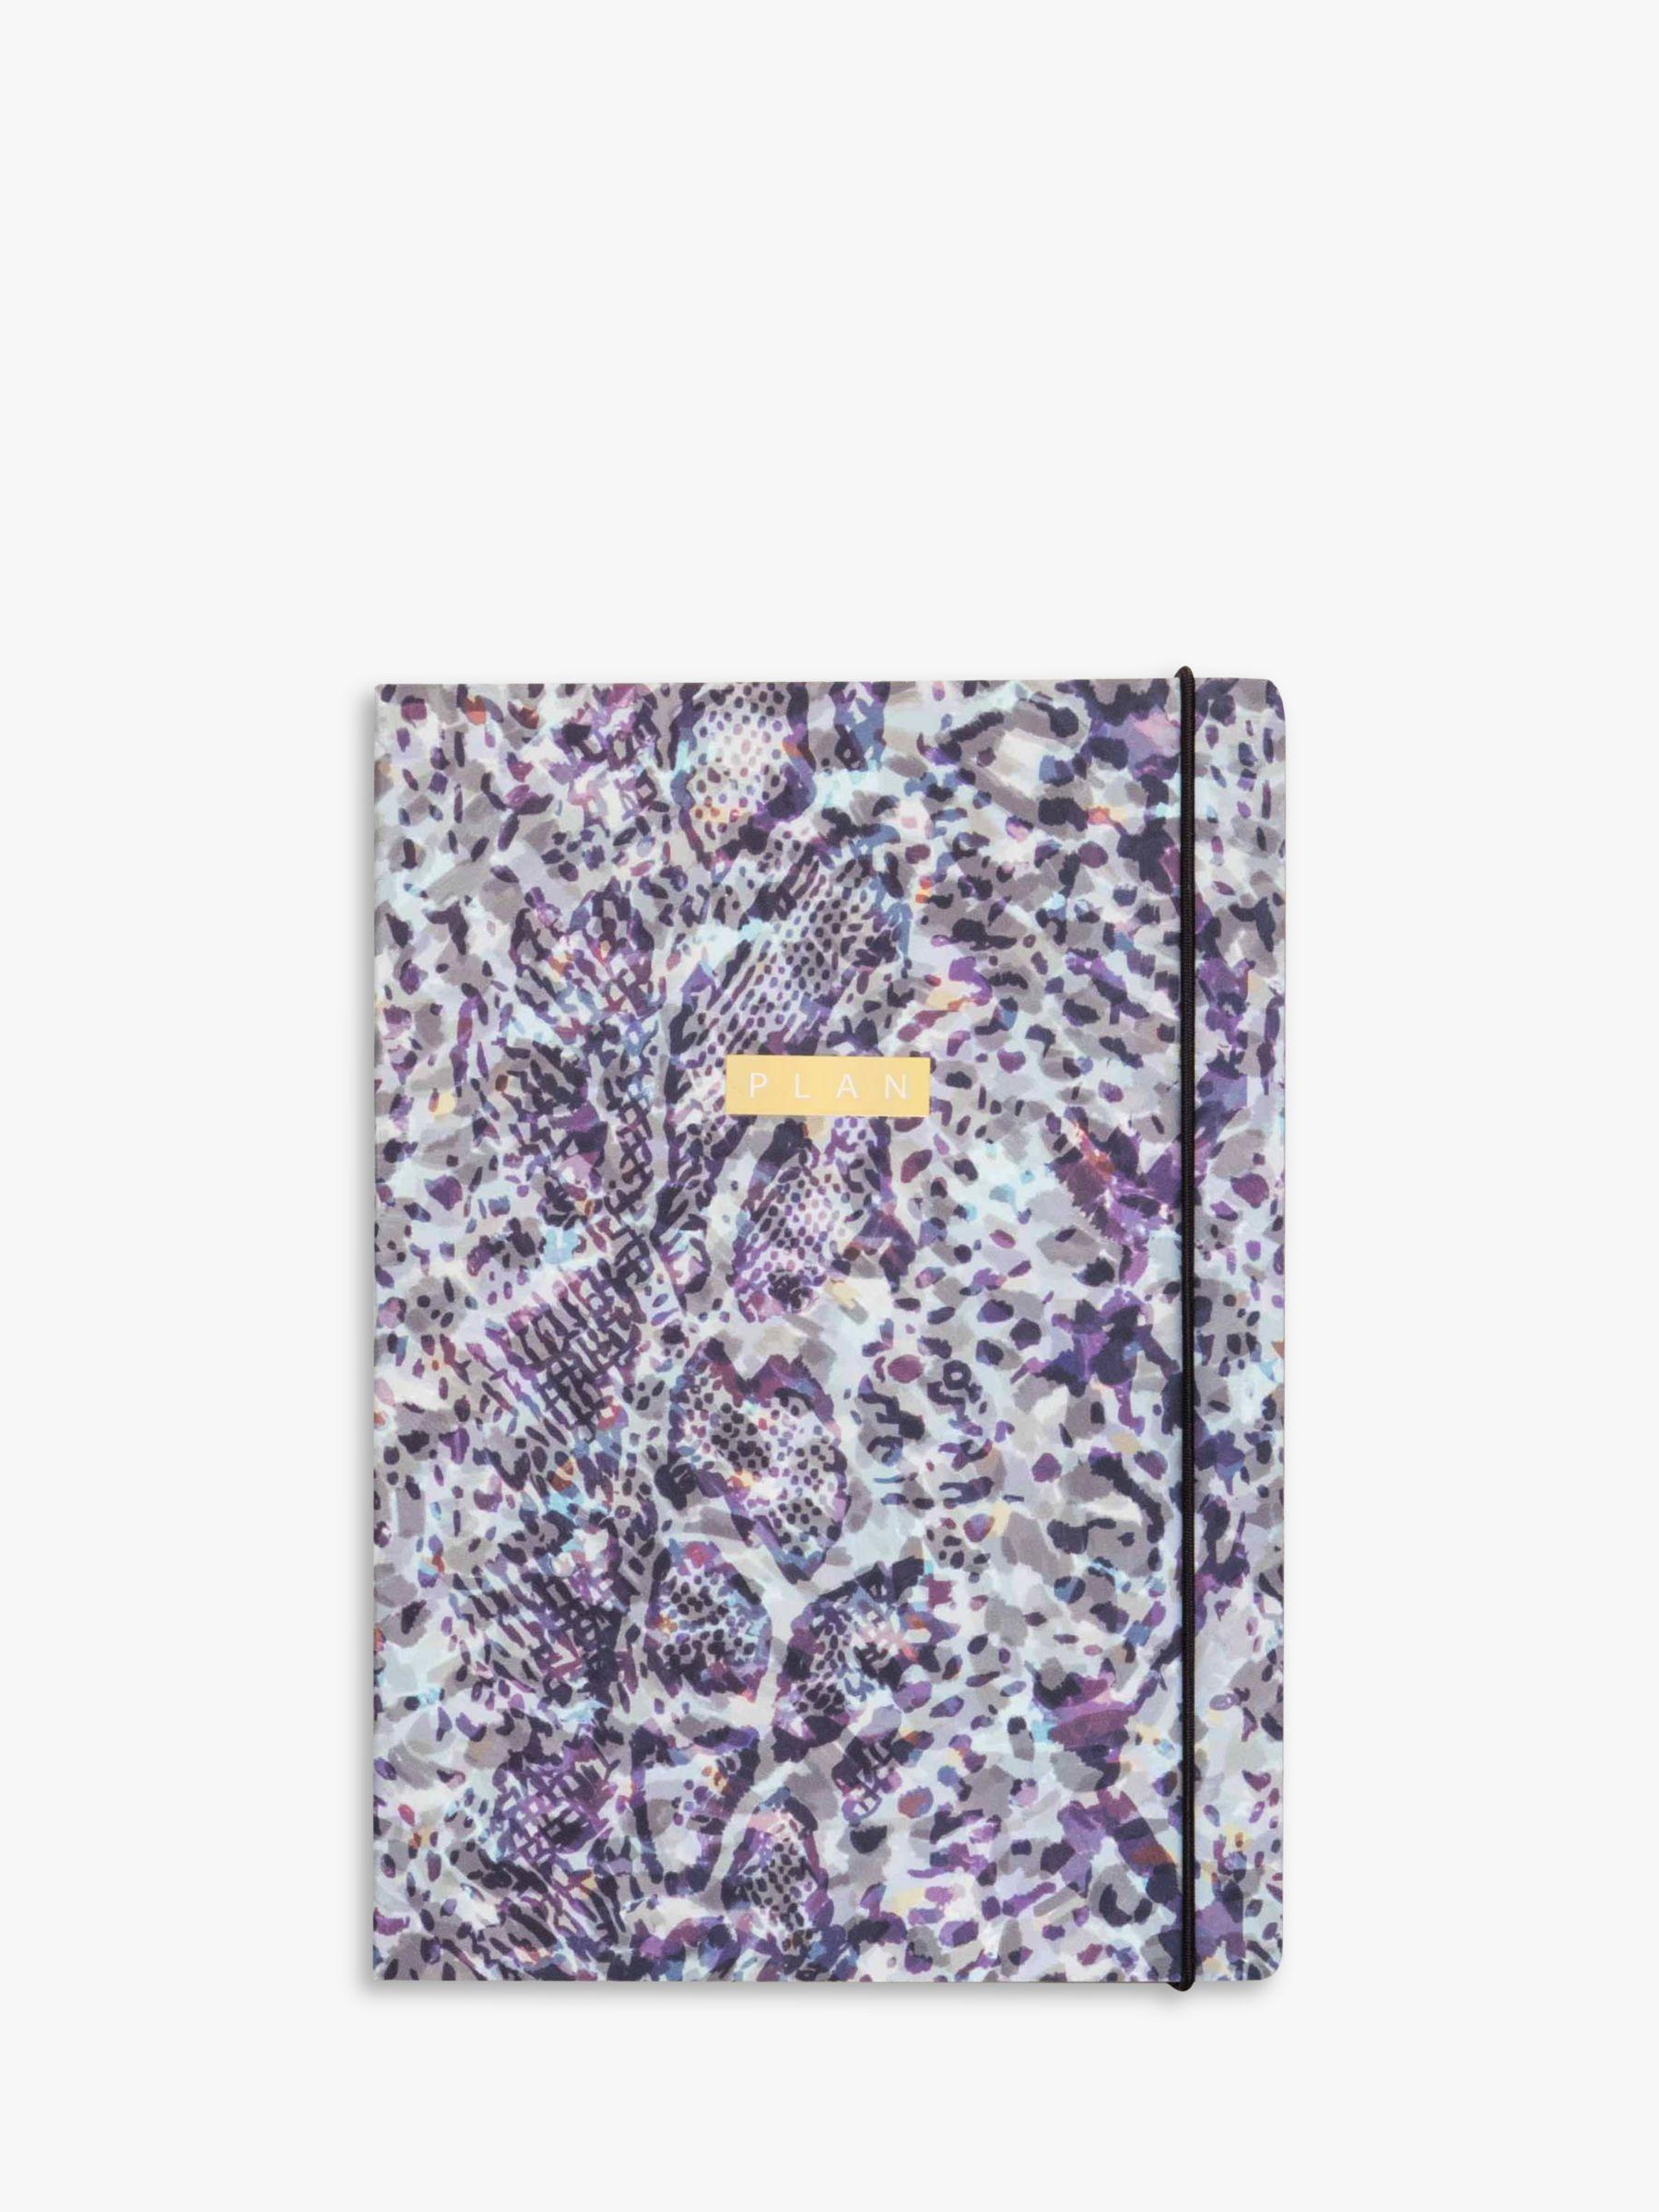 Portico Portico A5 Flexible Snake Print Notebook